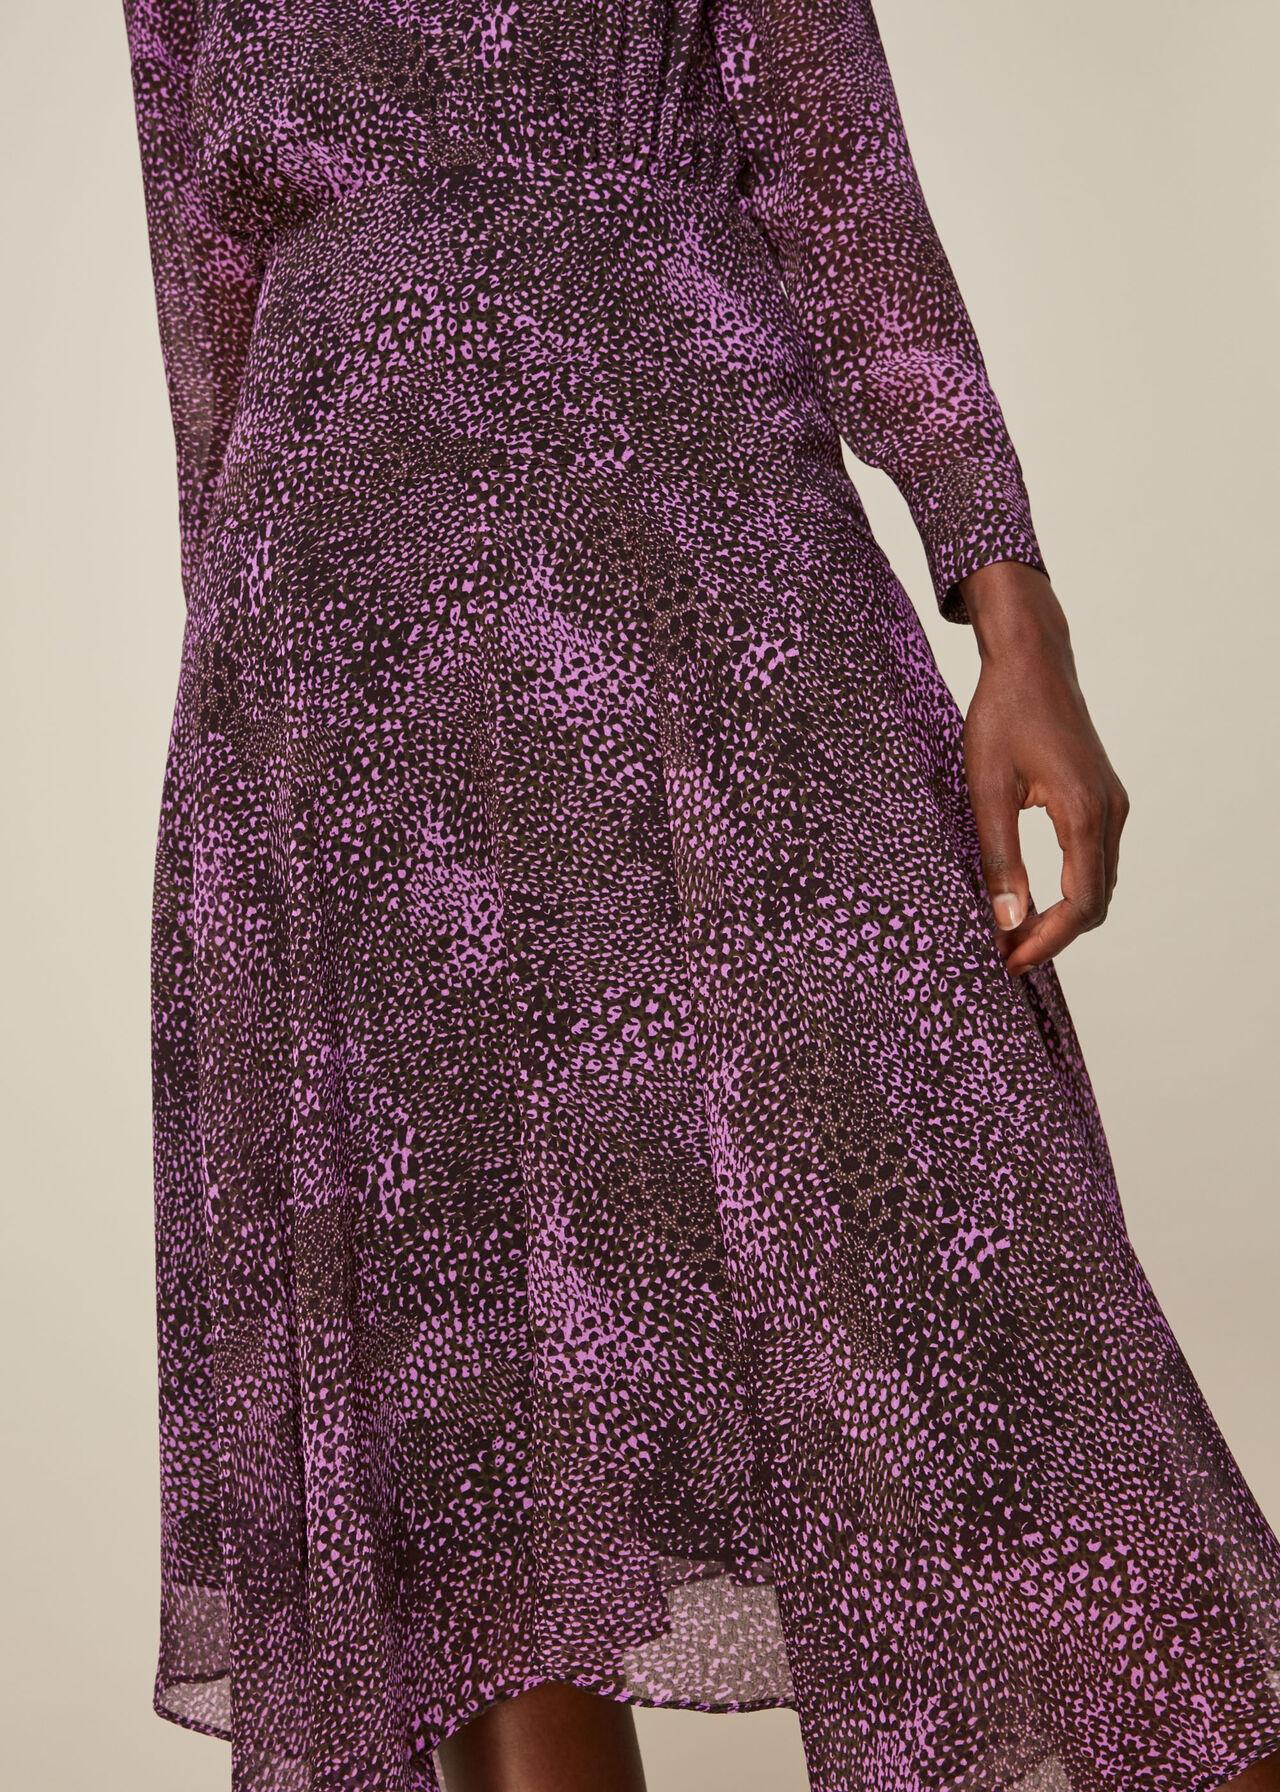 Snake Print Carlotta Dress